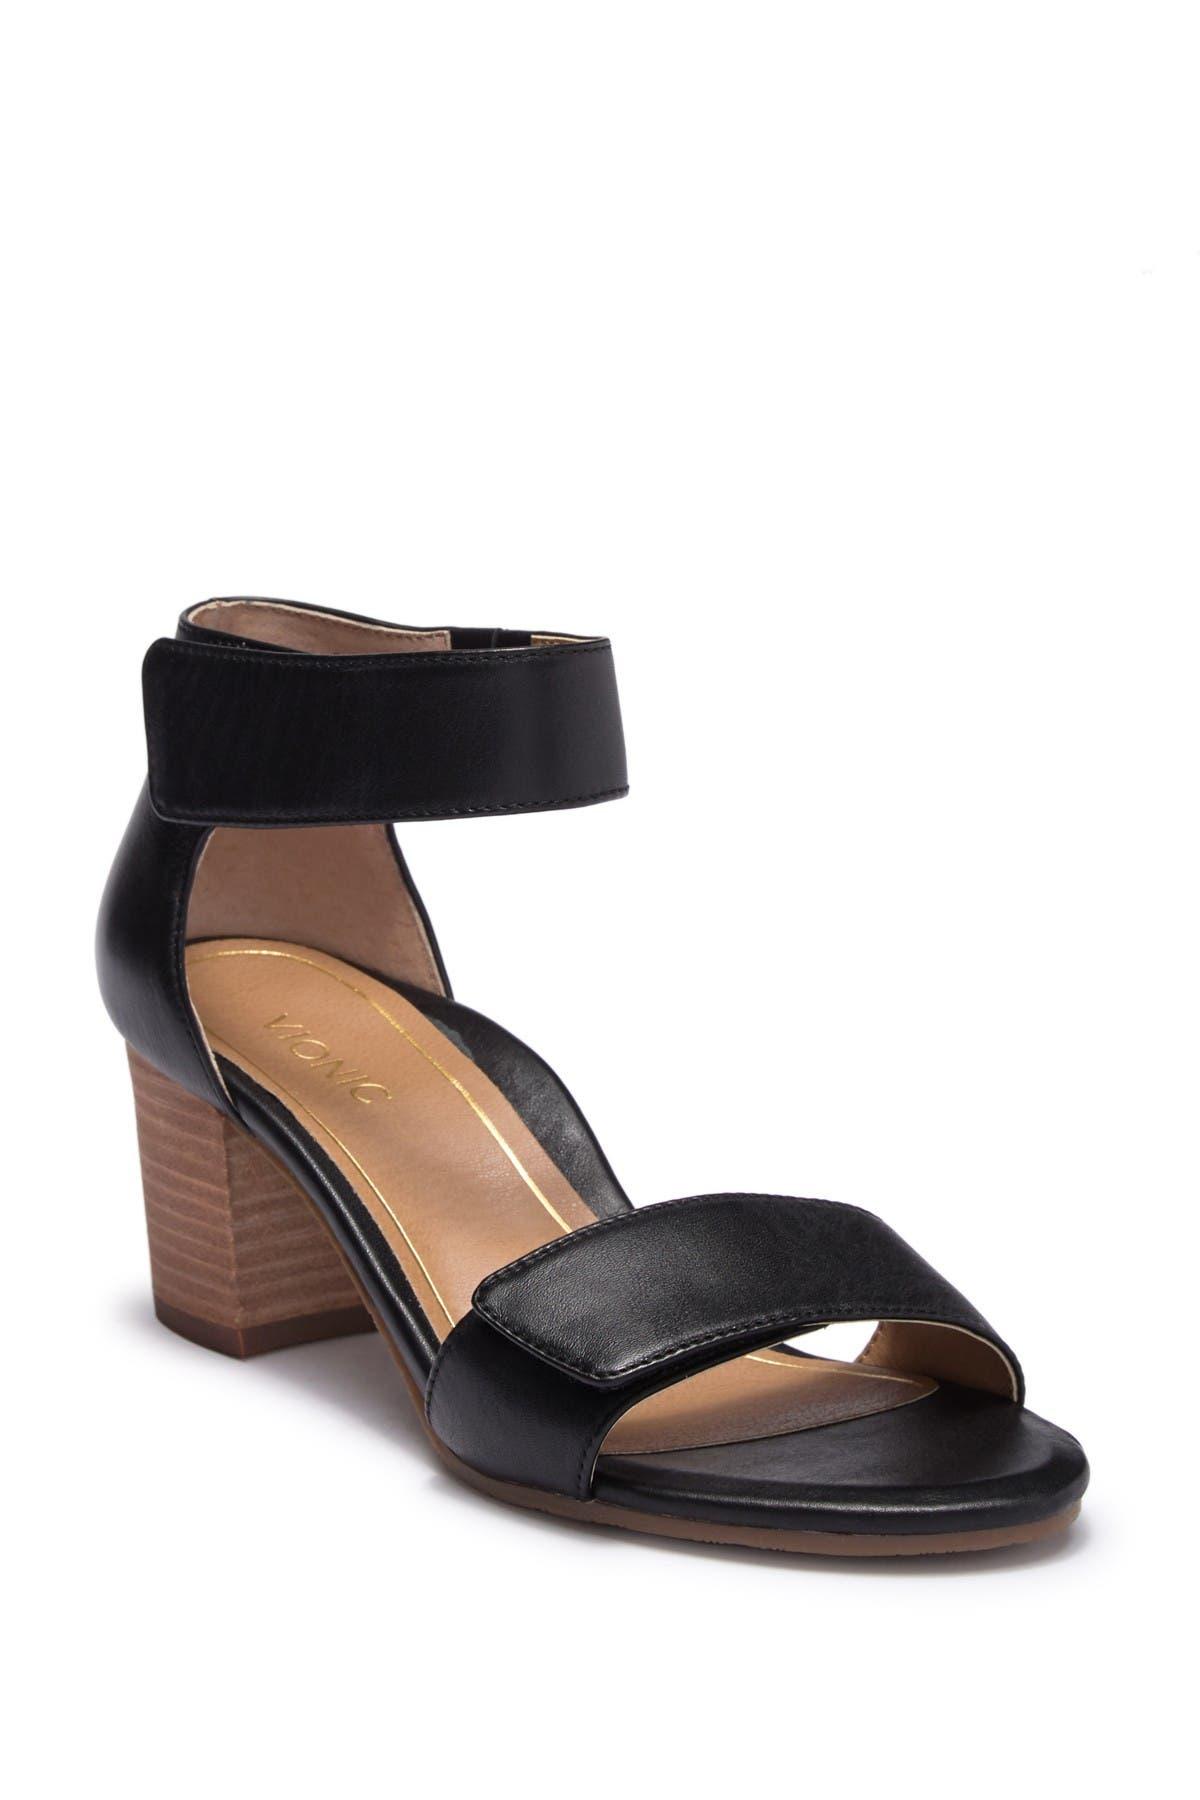 Vionic   Solana Block Heel Ankle Strap